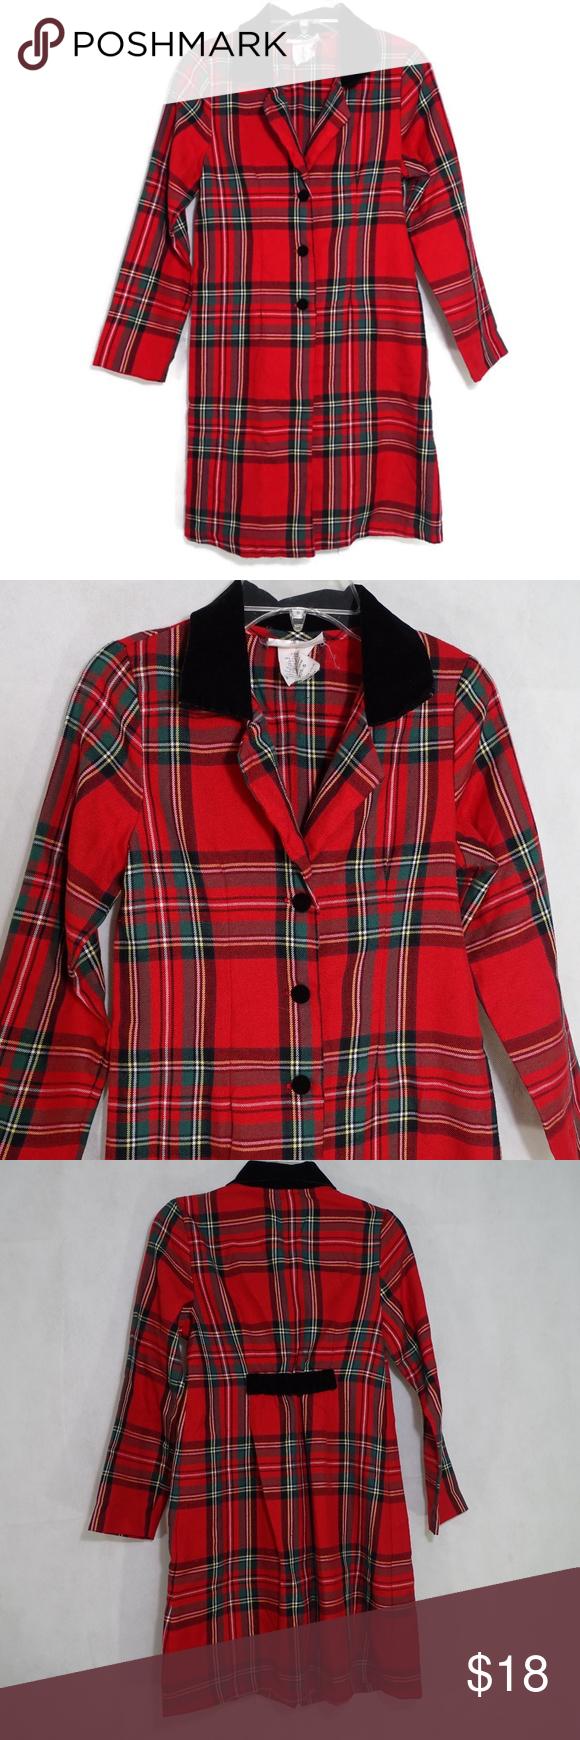 ce44fa8db71b Bonnie Jean Coat Dress Girls Size 10 ITEM DESCRIPTION: Bonnie Jean  Christmas Plaid Coat Dress